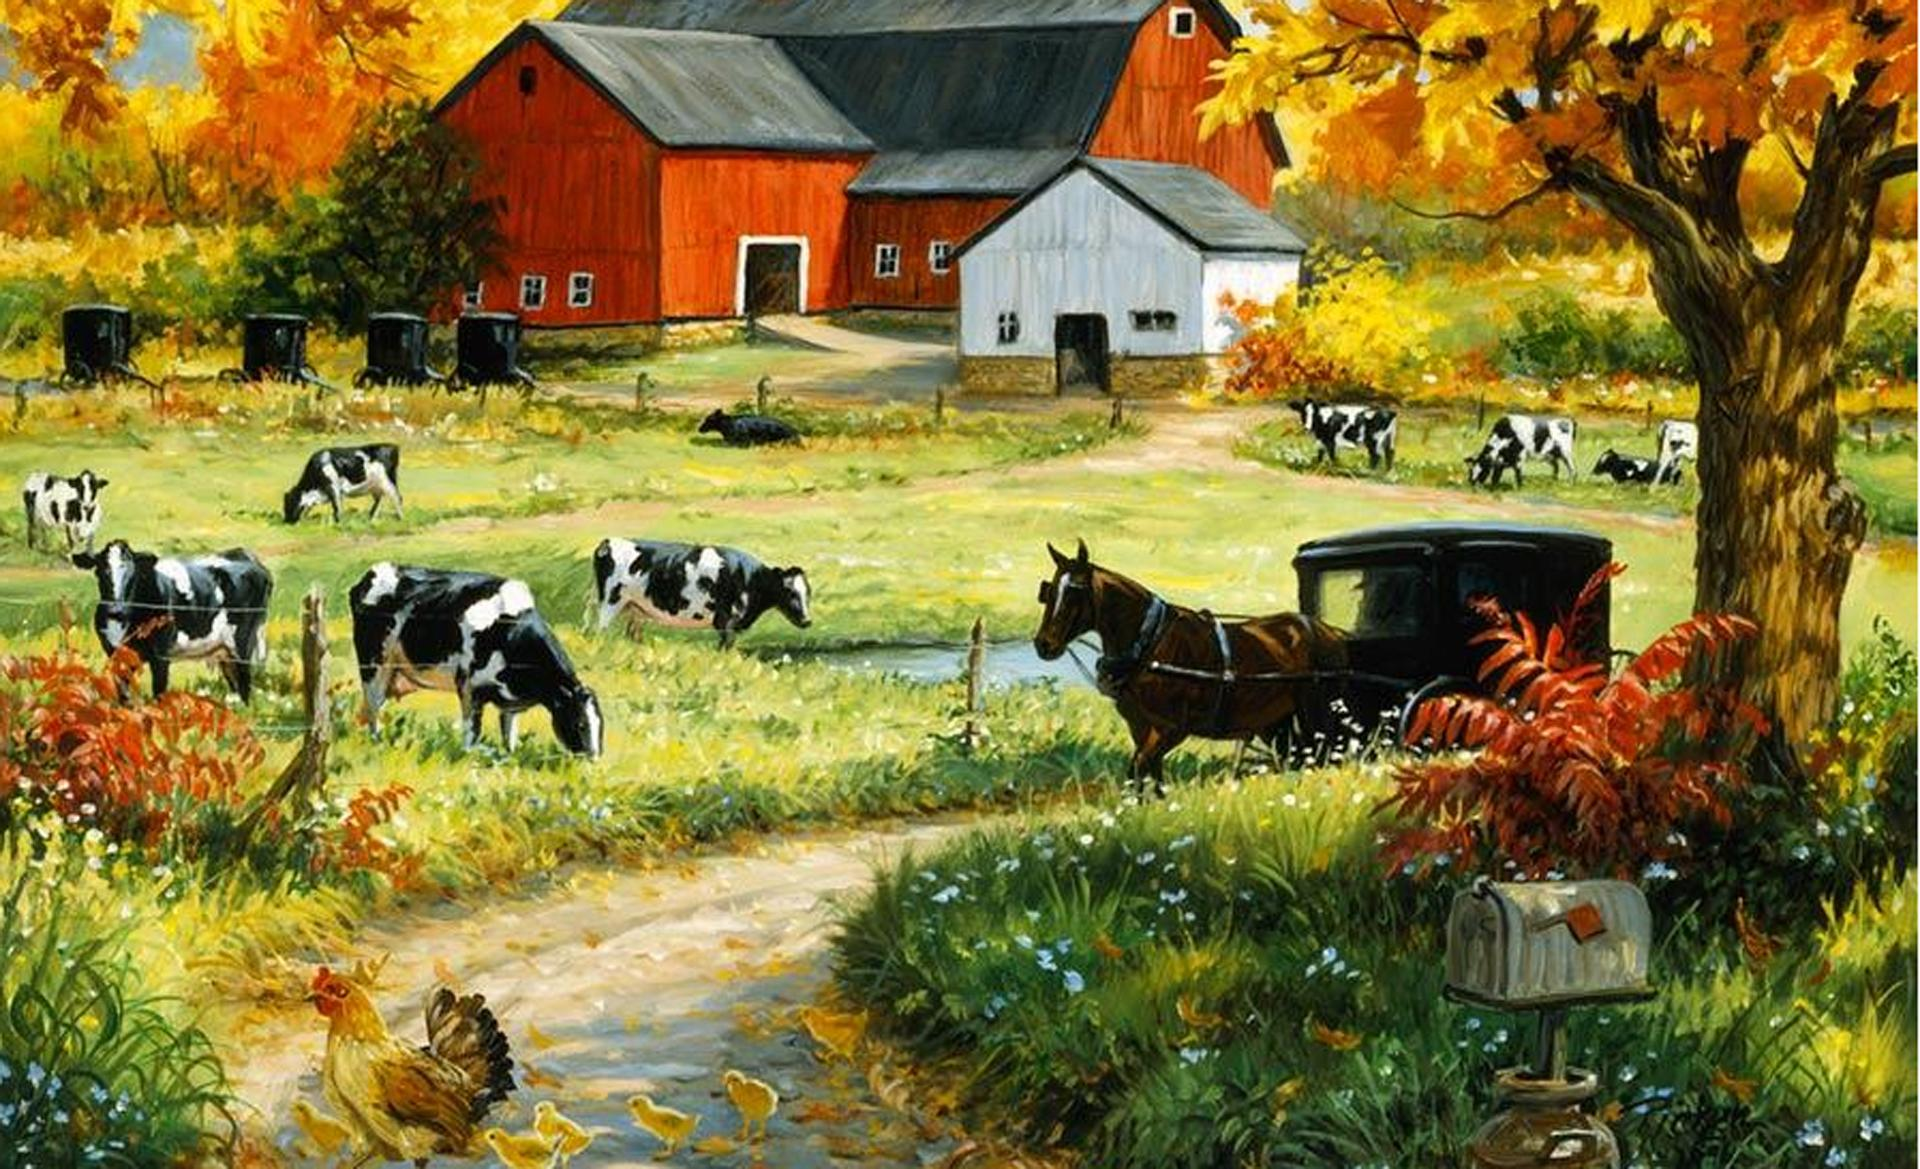 Farm Landscape Wallpaper Background Download 8 5627 1920x1169